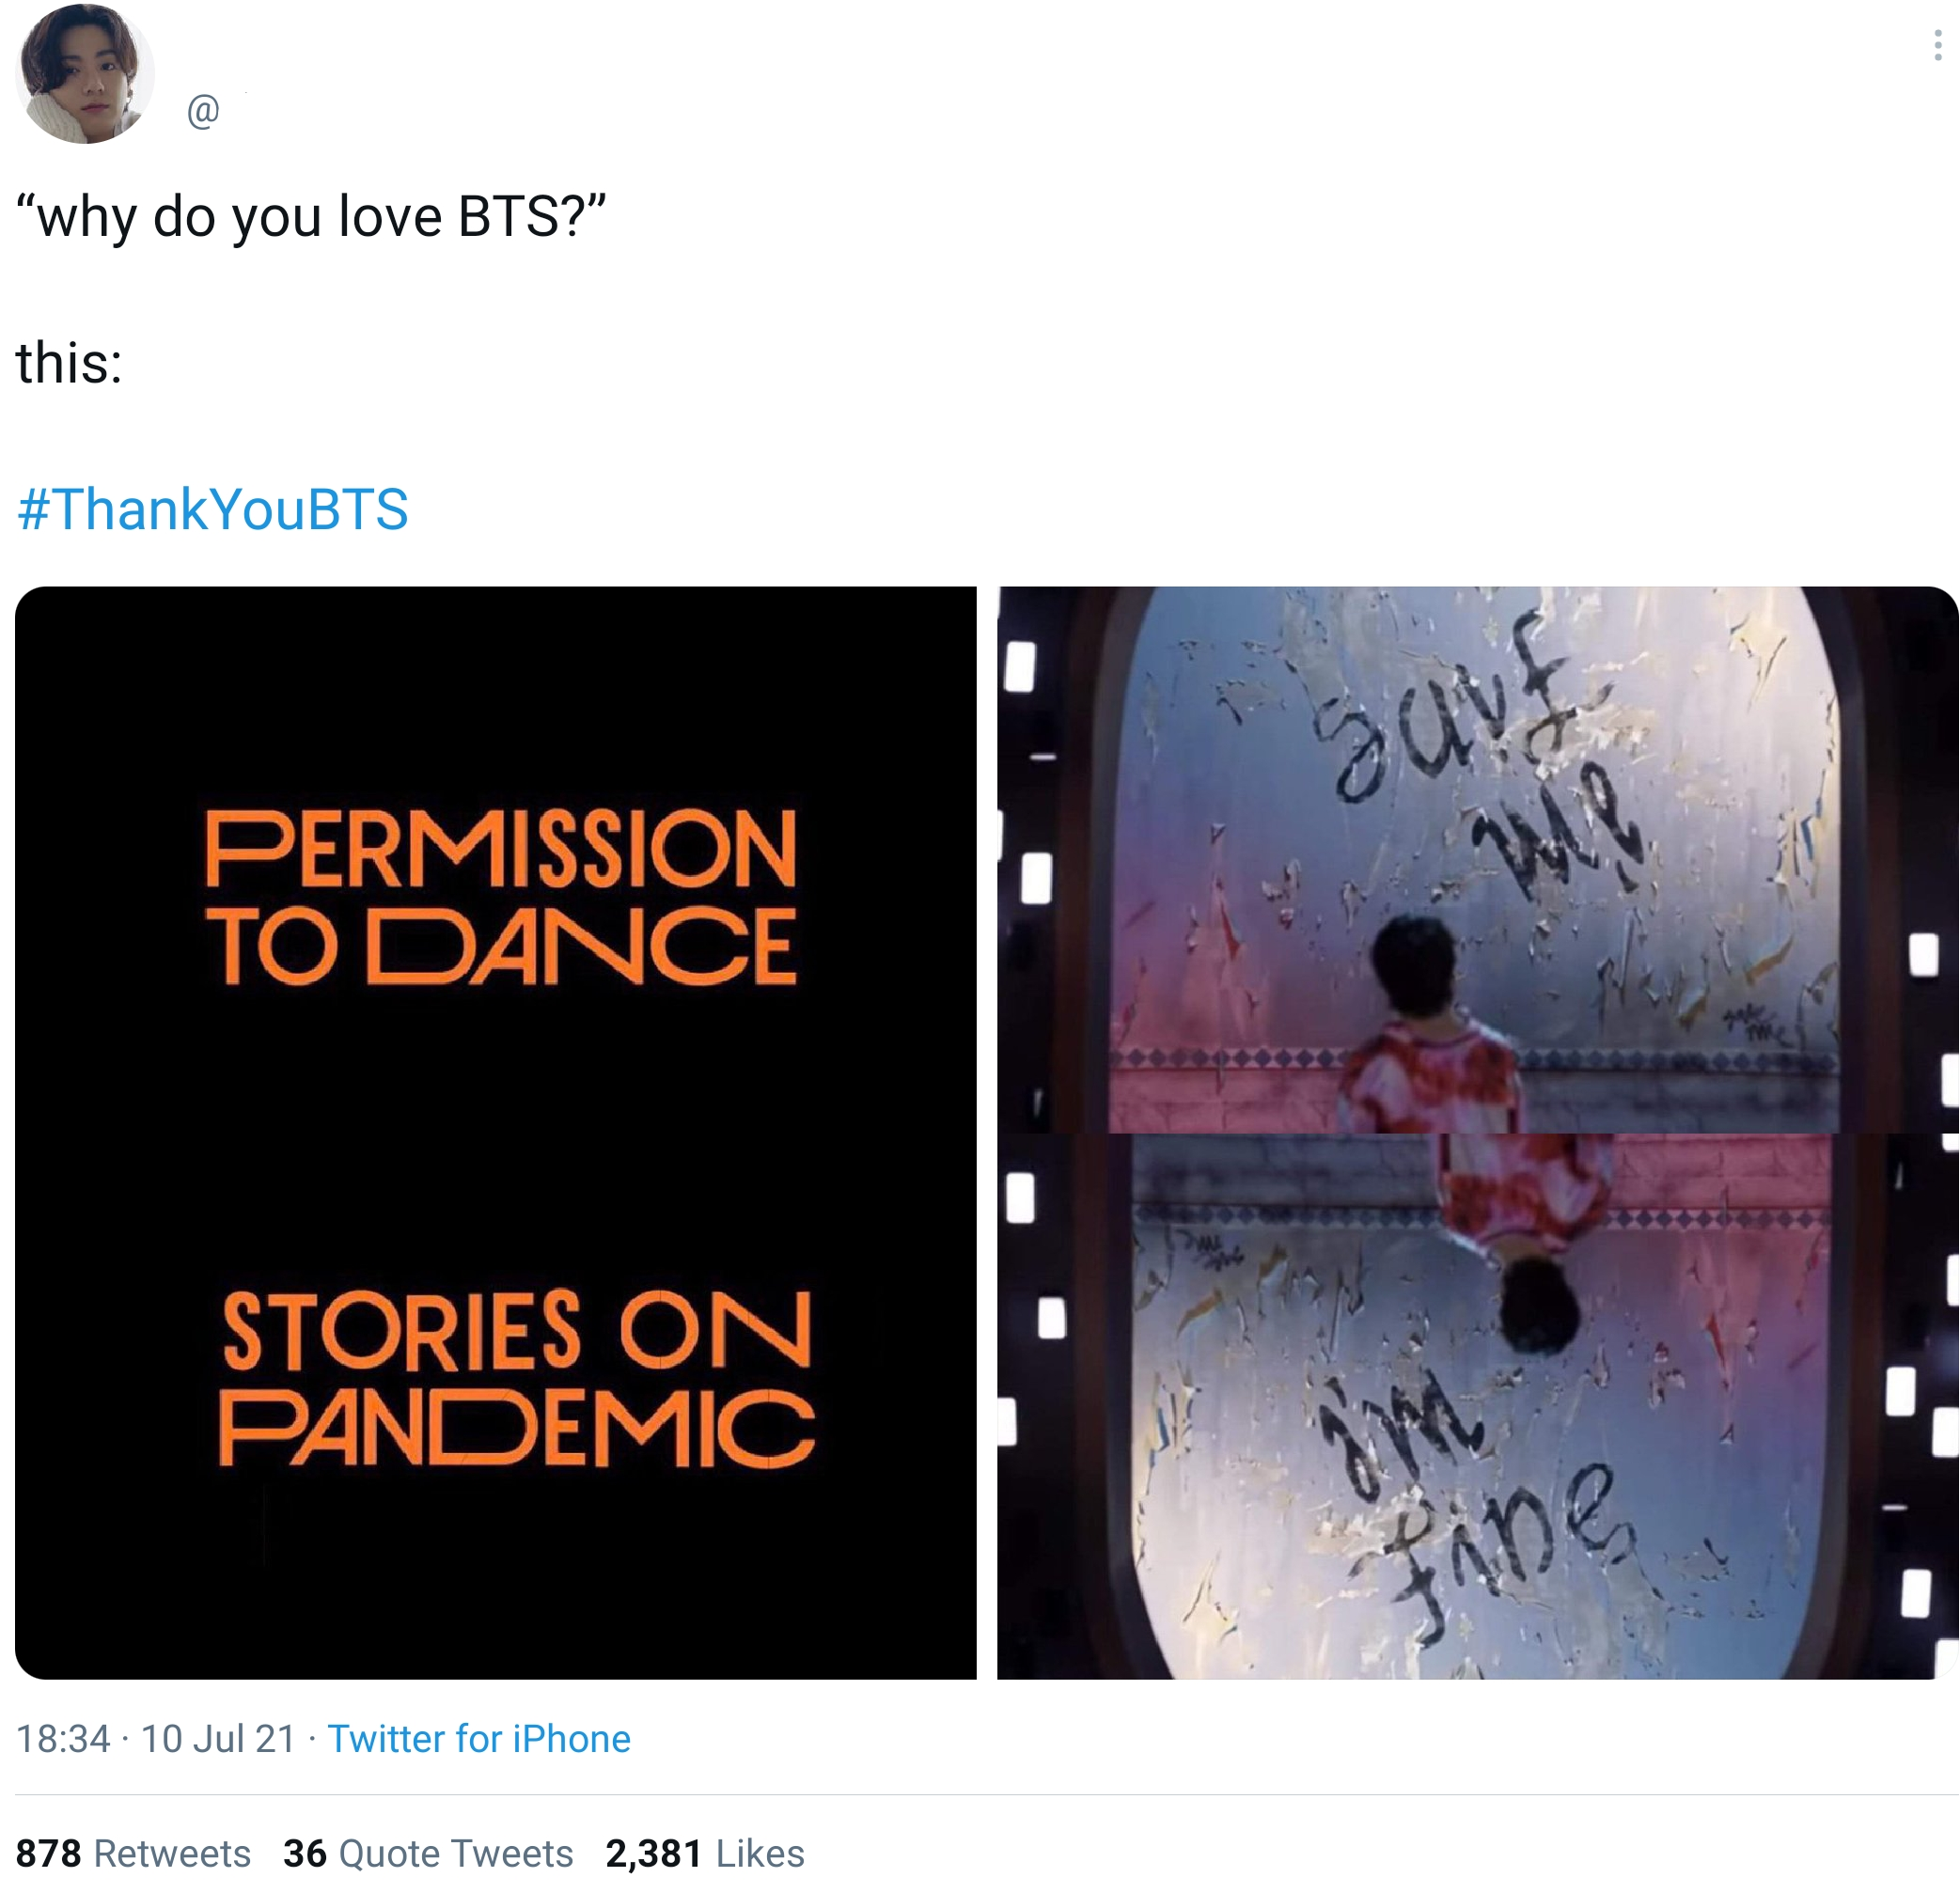 BTS Permission To Dance: Makna Lagu dari Bahasa Isyarat hingga Teori Cover 7